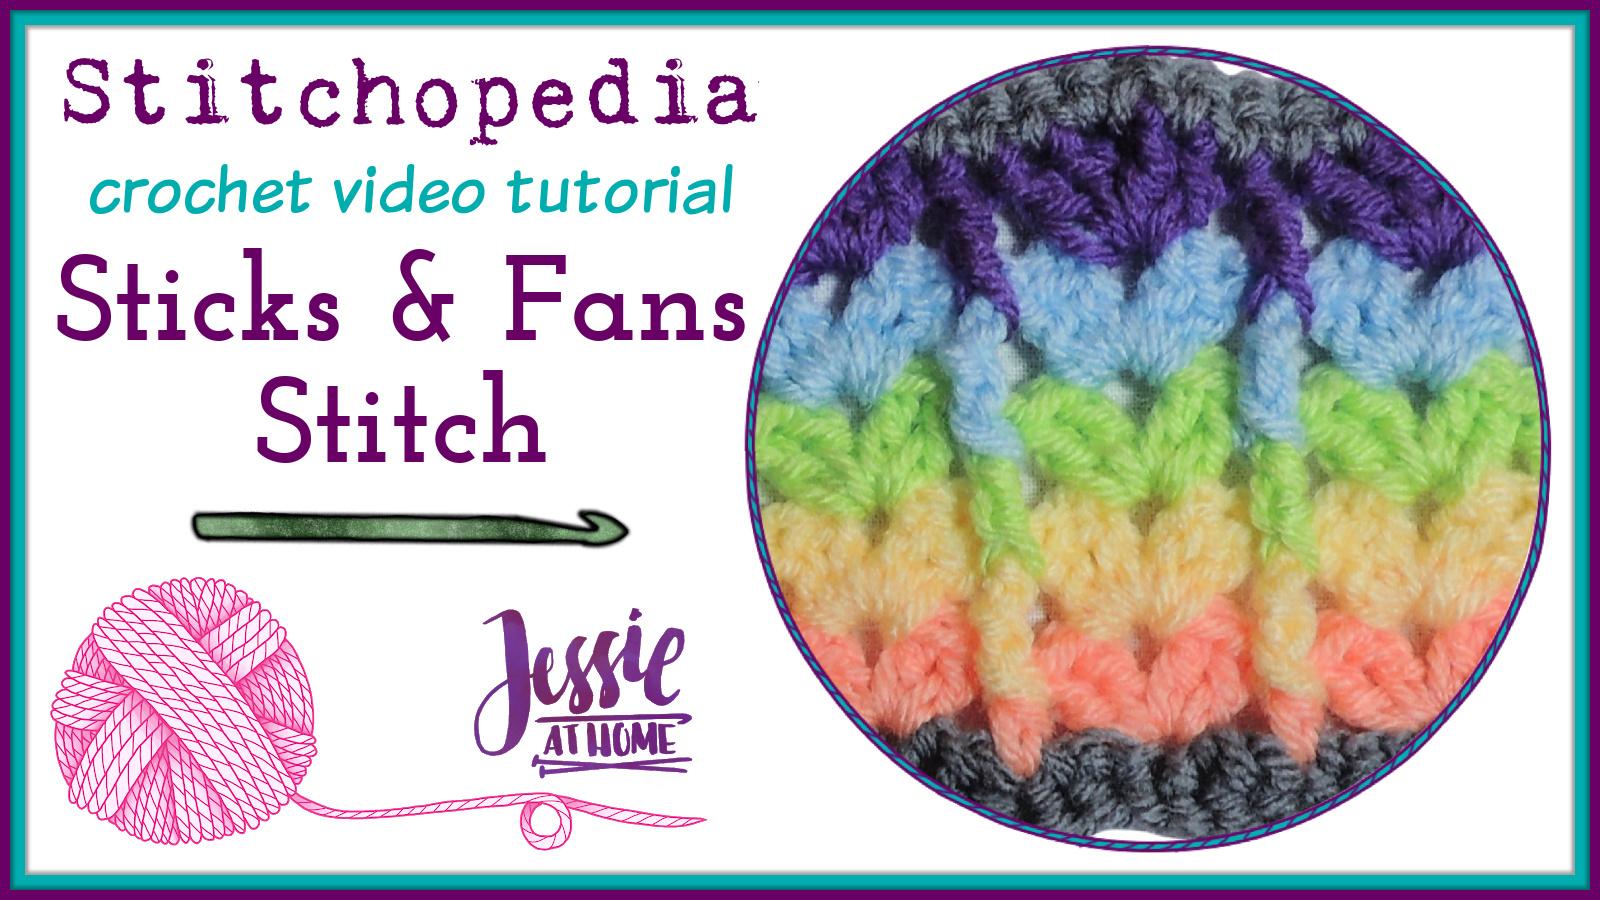 Sticks and Fans Stitch Stitchopedia Crochet Tutorial - Cover